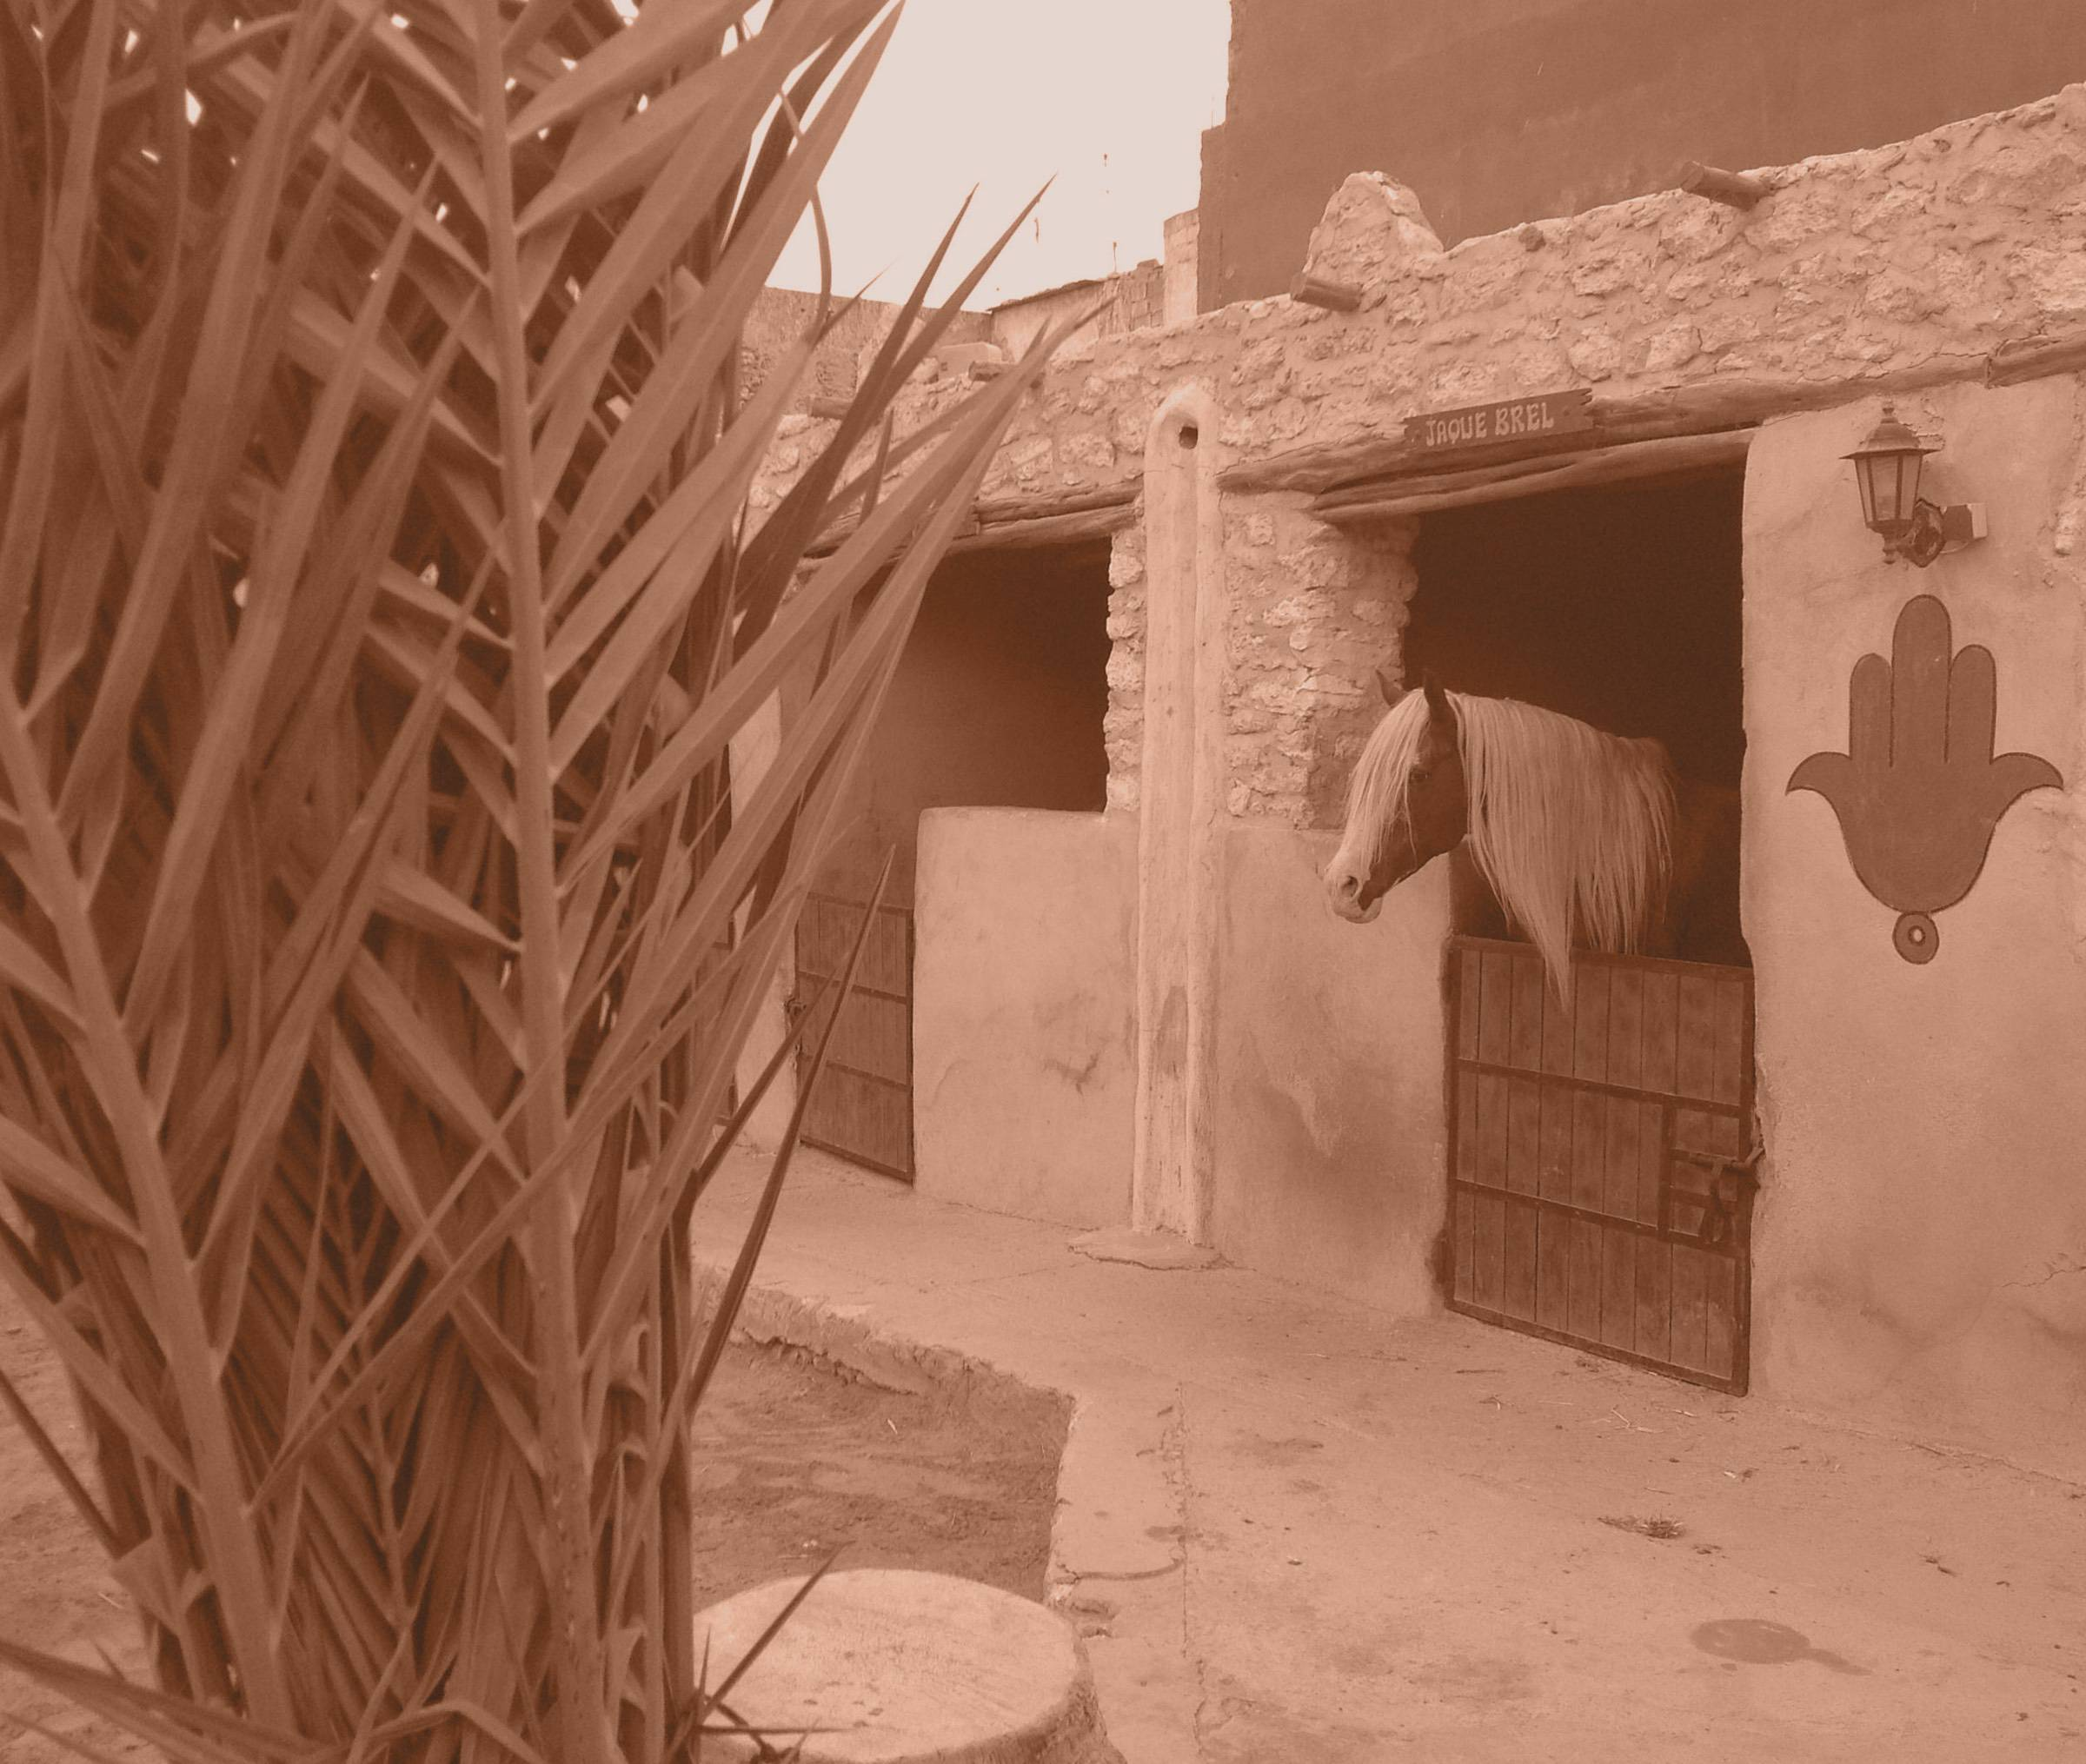 Ranch de Diabat is located in Essaouira, Morocco.